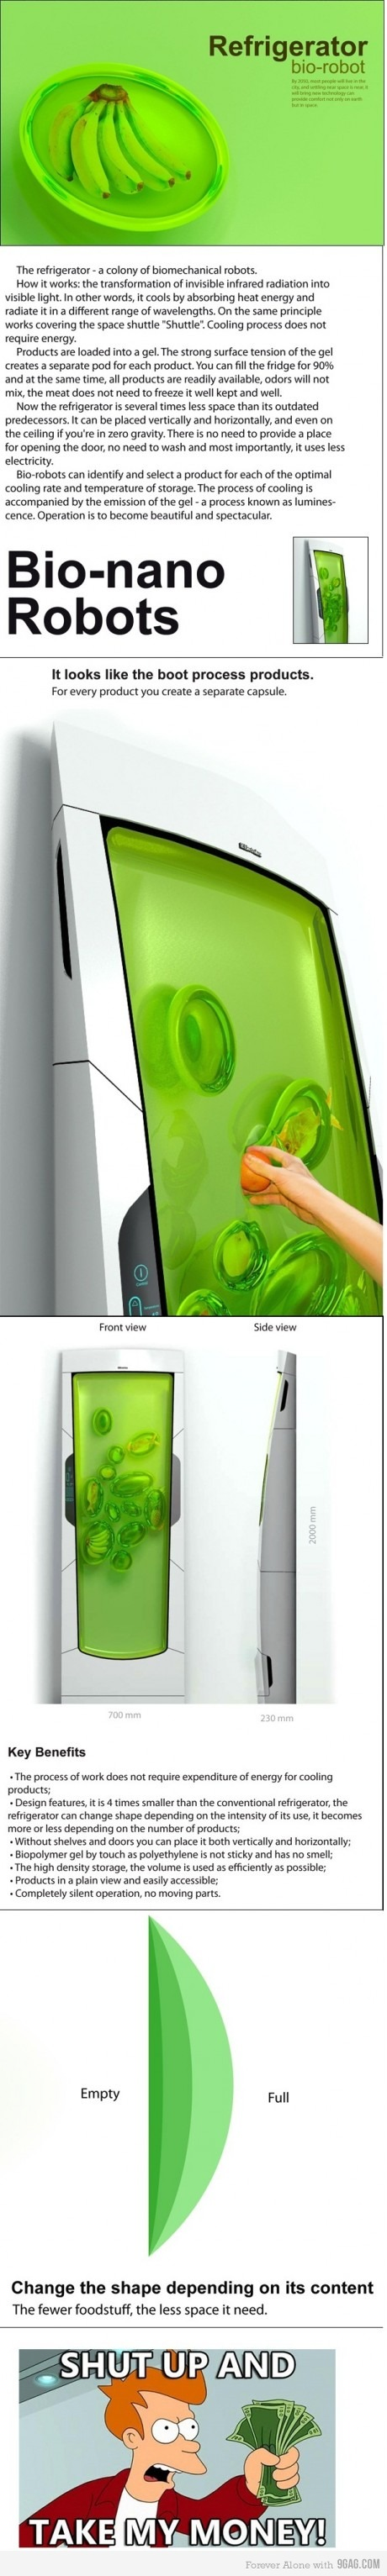 bio-robot refrigerator